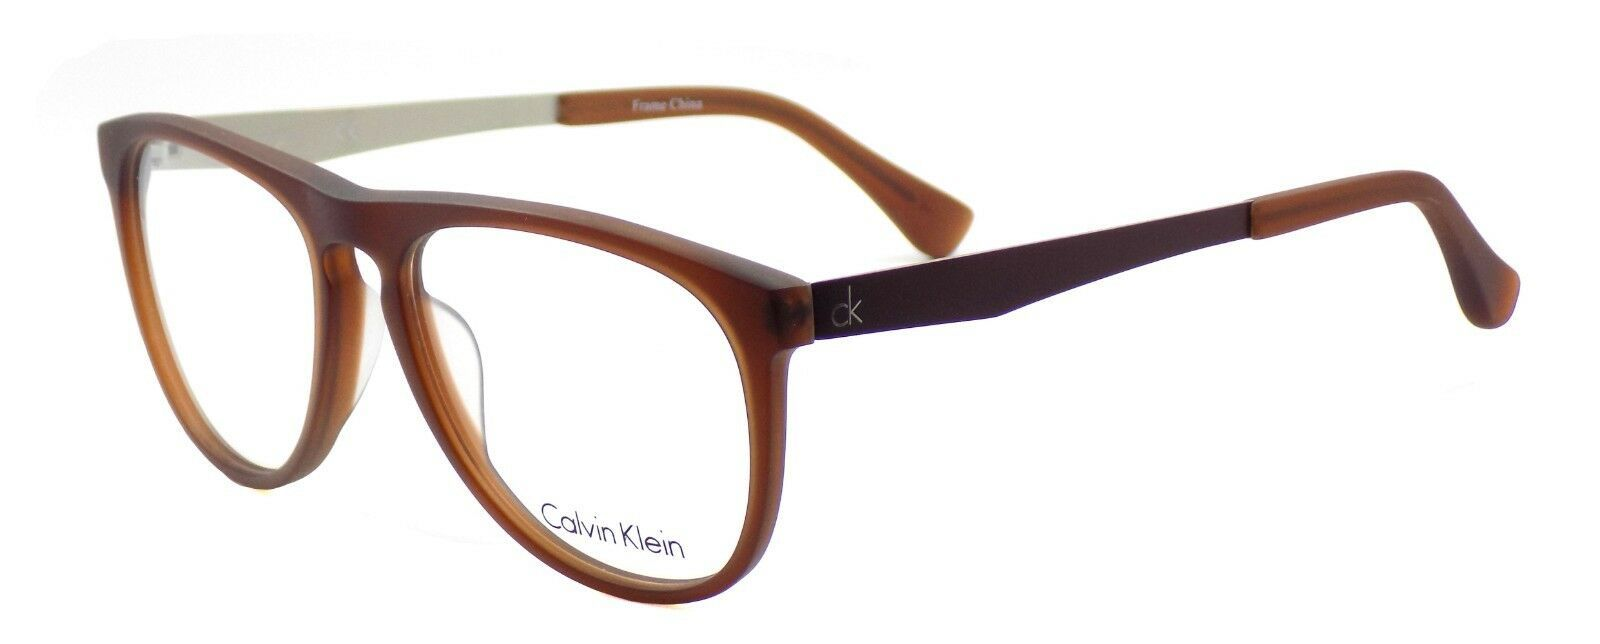 Calvin Klein CK5888 201 Men's Eyeglasses Frames Matte Brown 54-16-145 + CASE